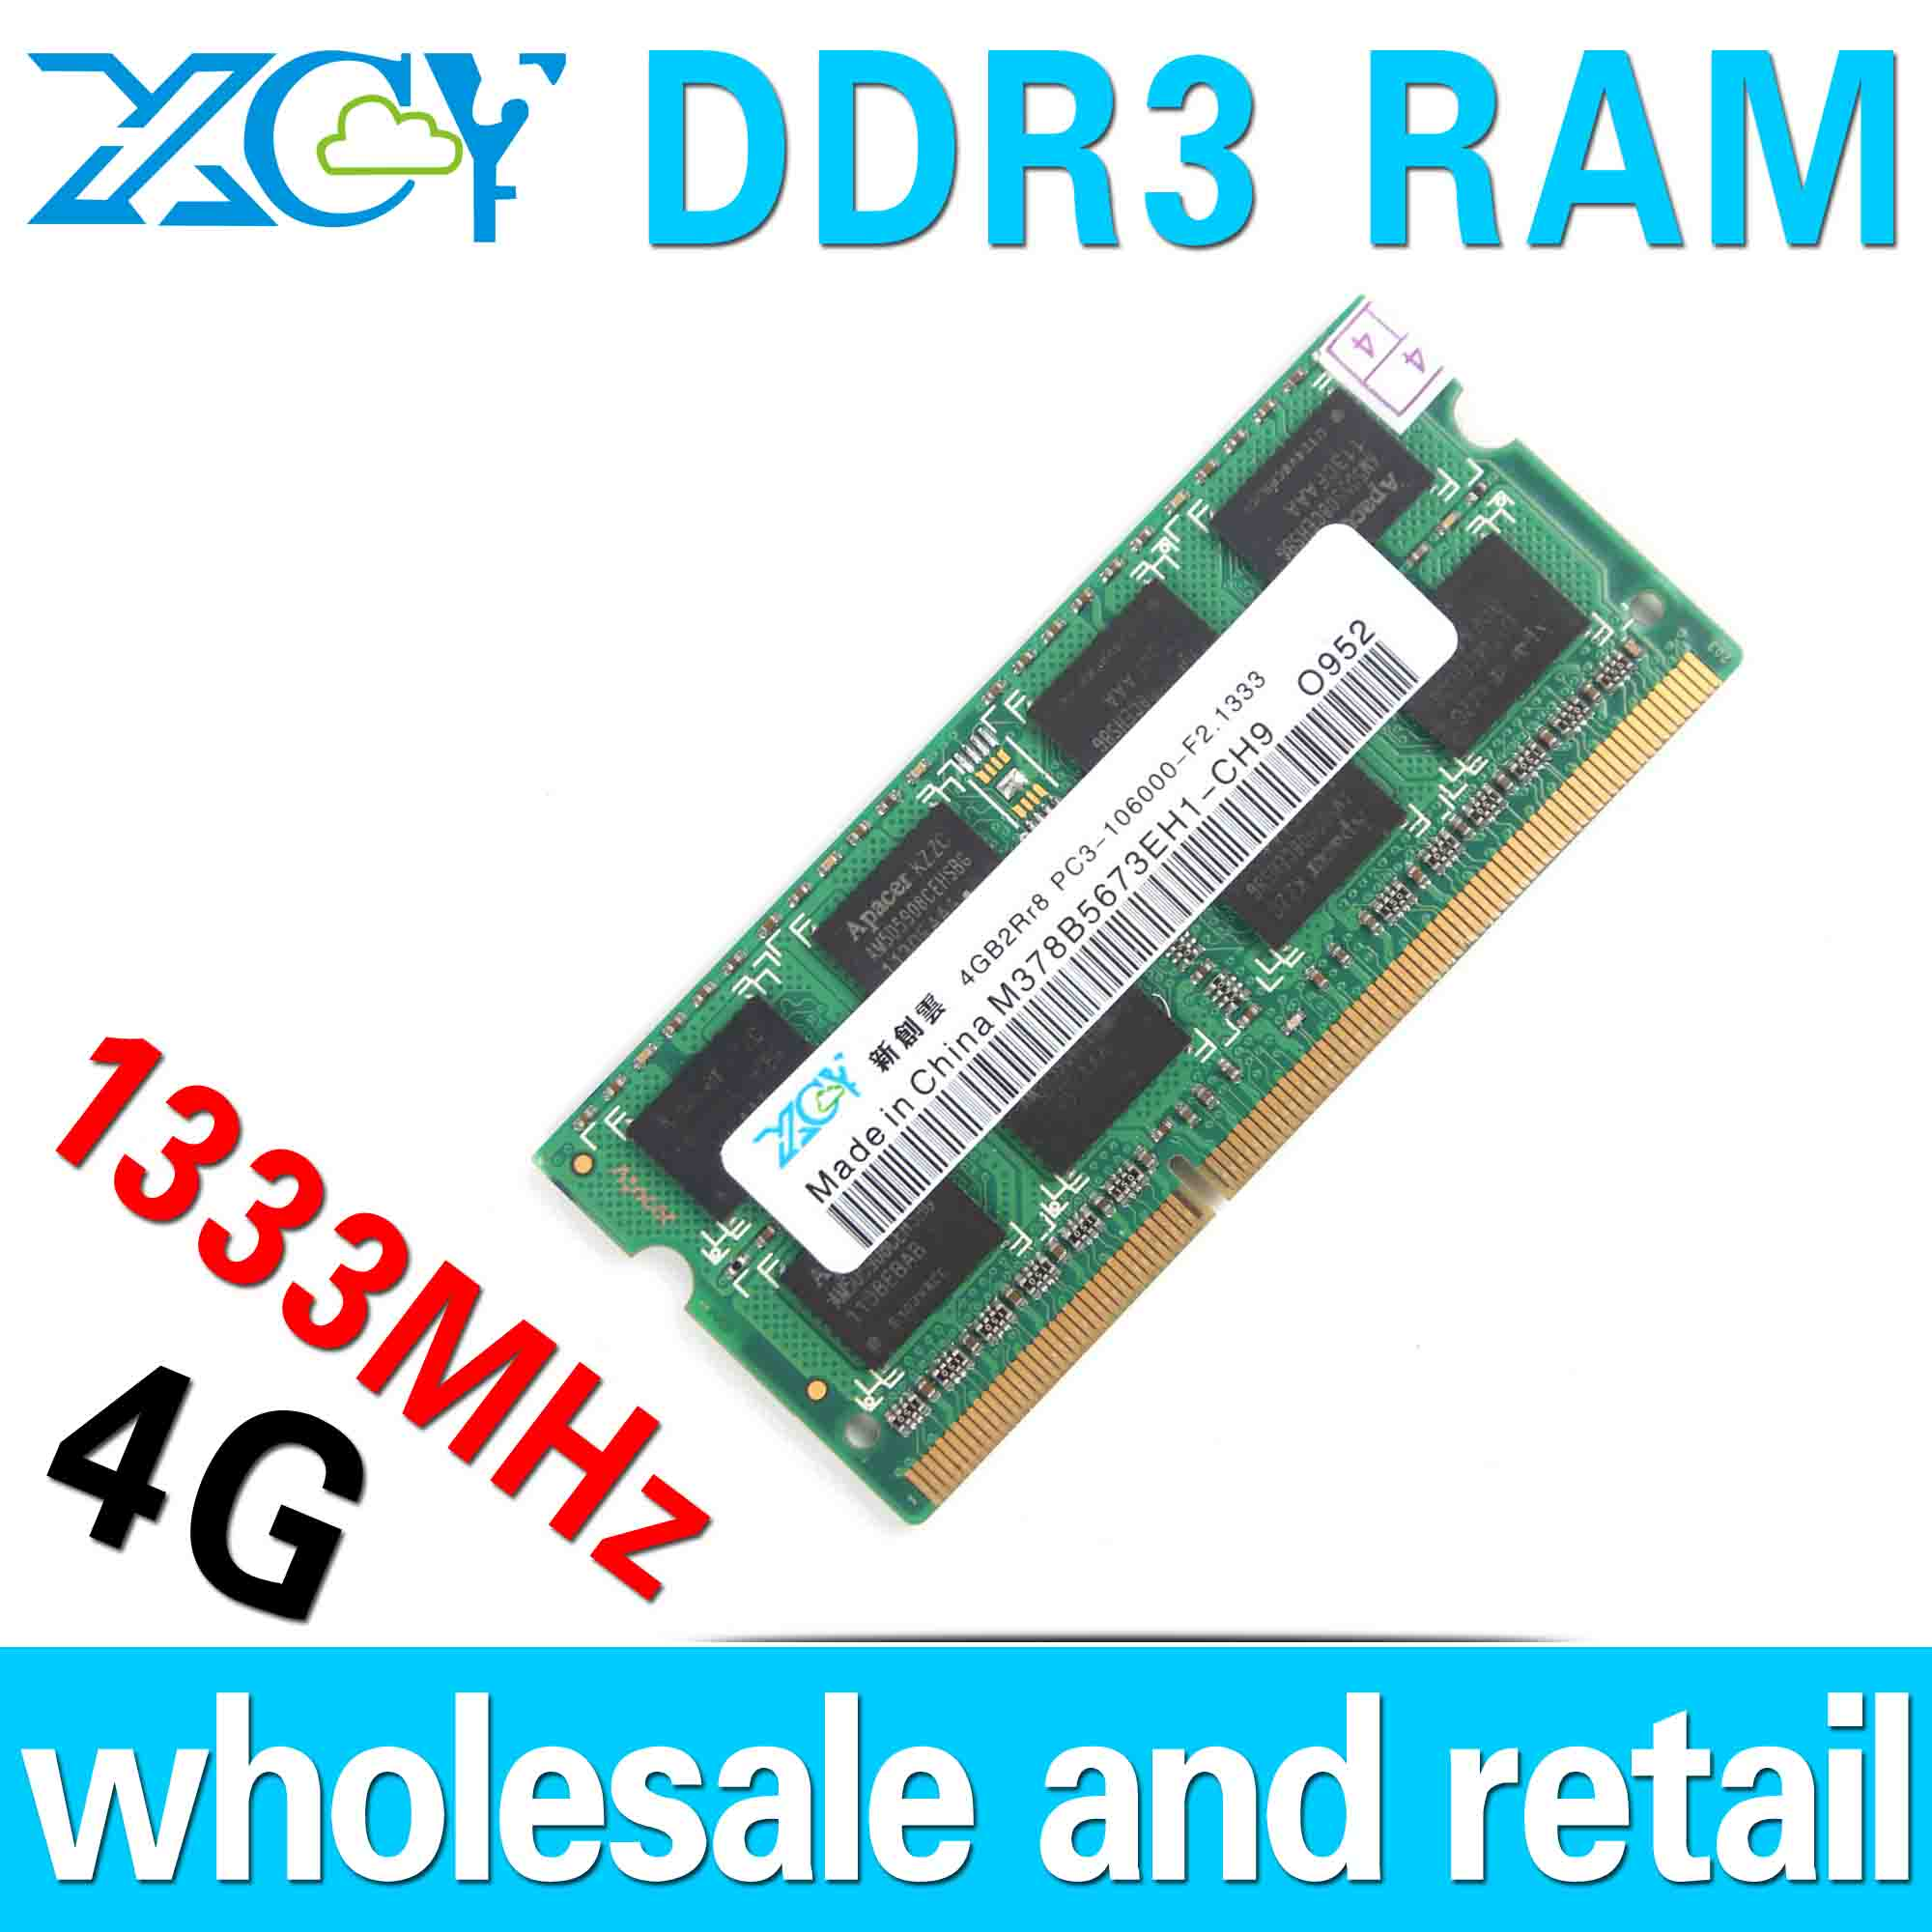 Wholesale Notebook Memory DDR3 4GB RAM Laptop Ddr3 Ram DDR3 1333MHZ SODIMM COMPUTER RAM